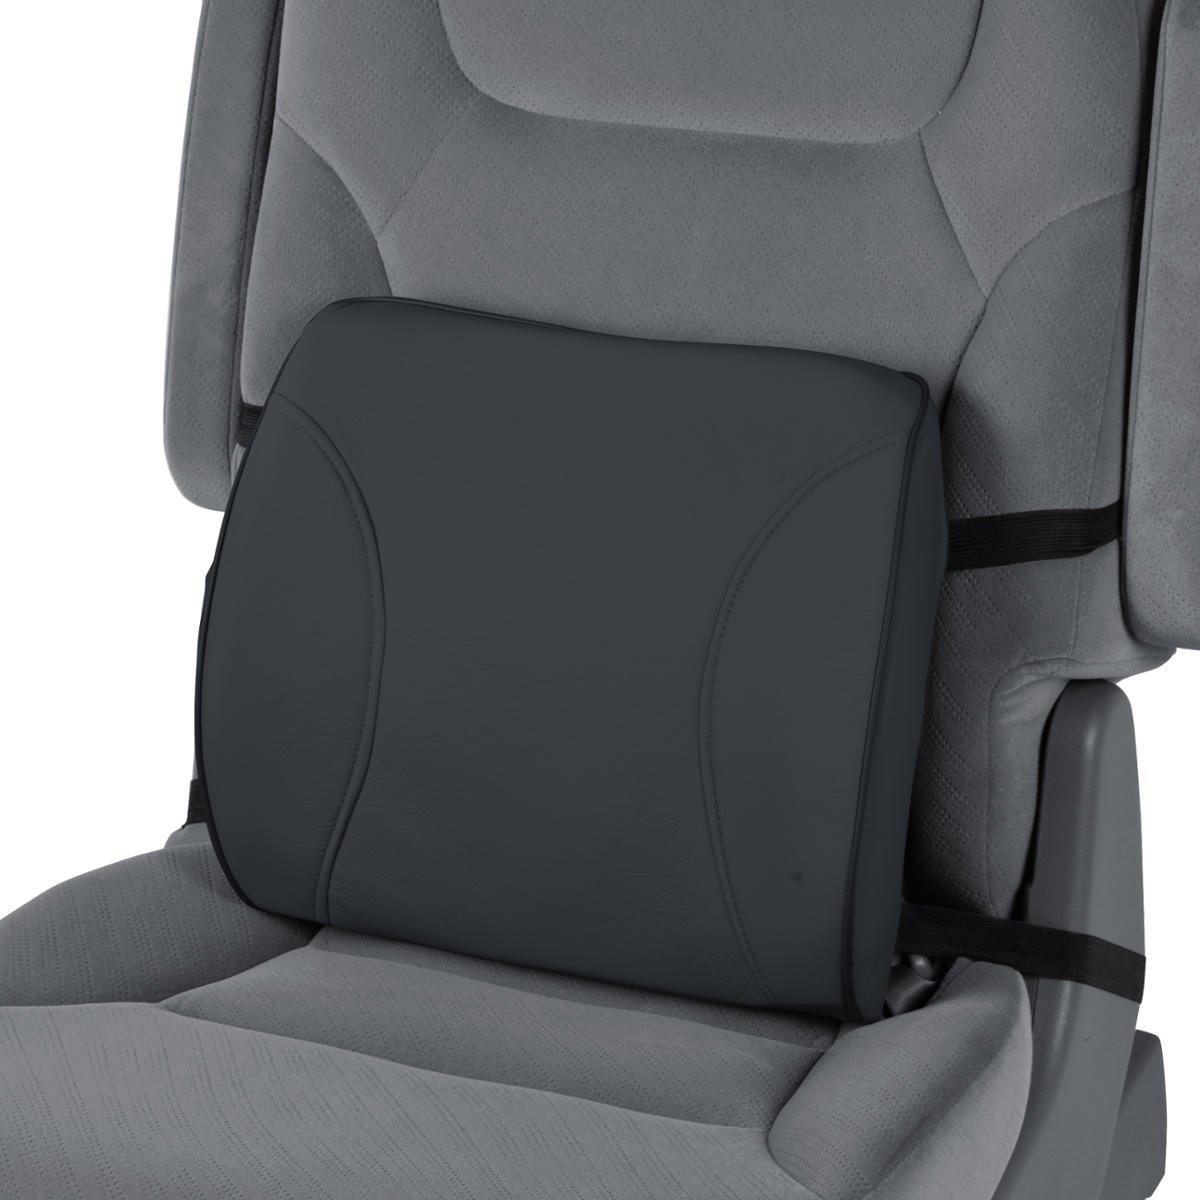 Amazon.com: MotorTrend Lumbar Back Support - Portable Orthopedic ...